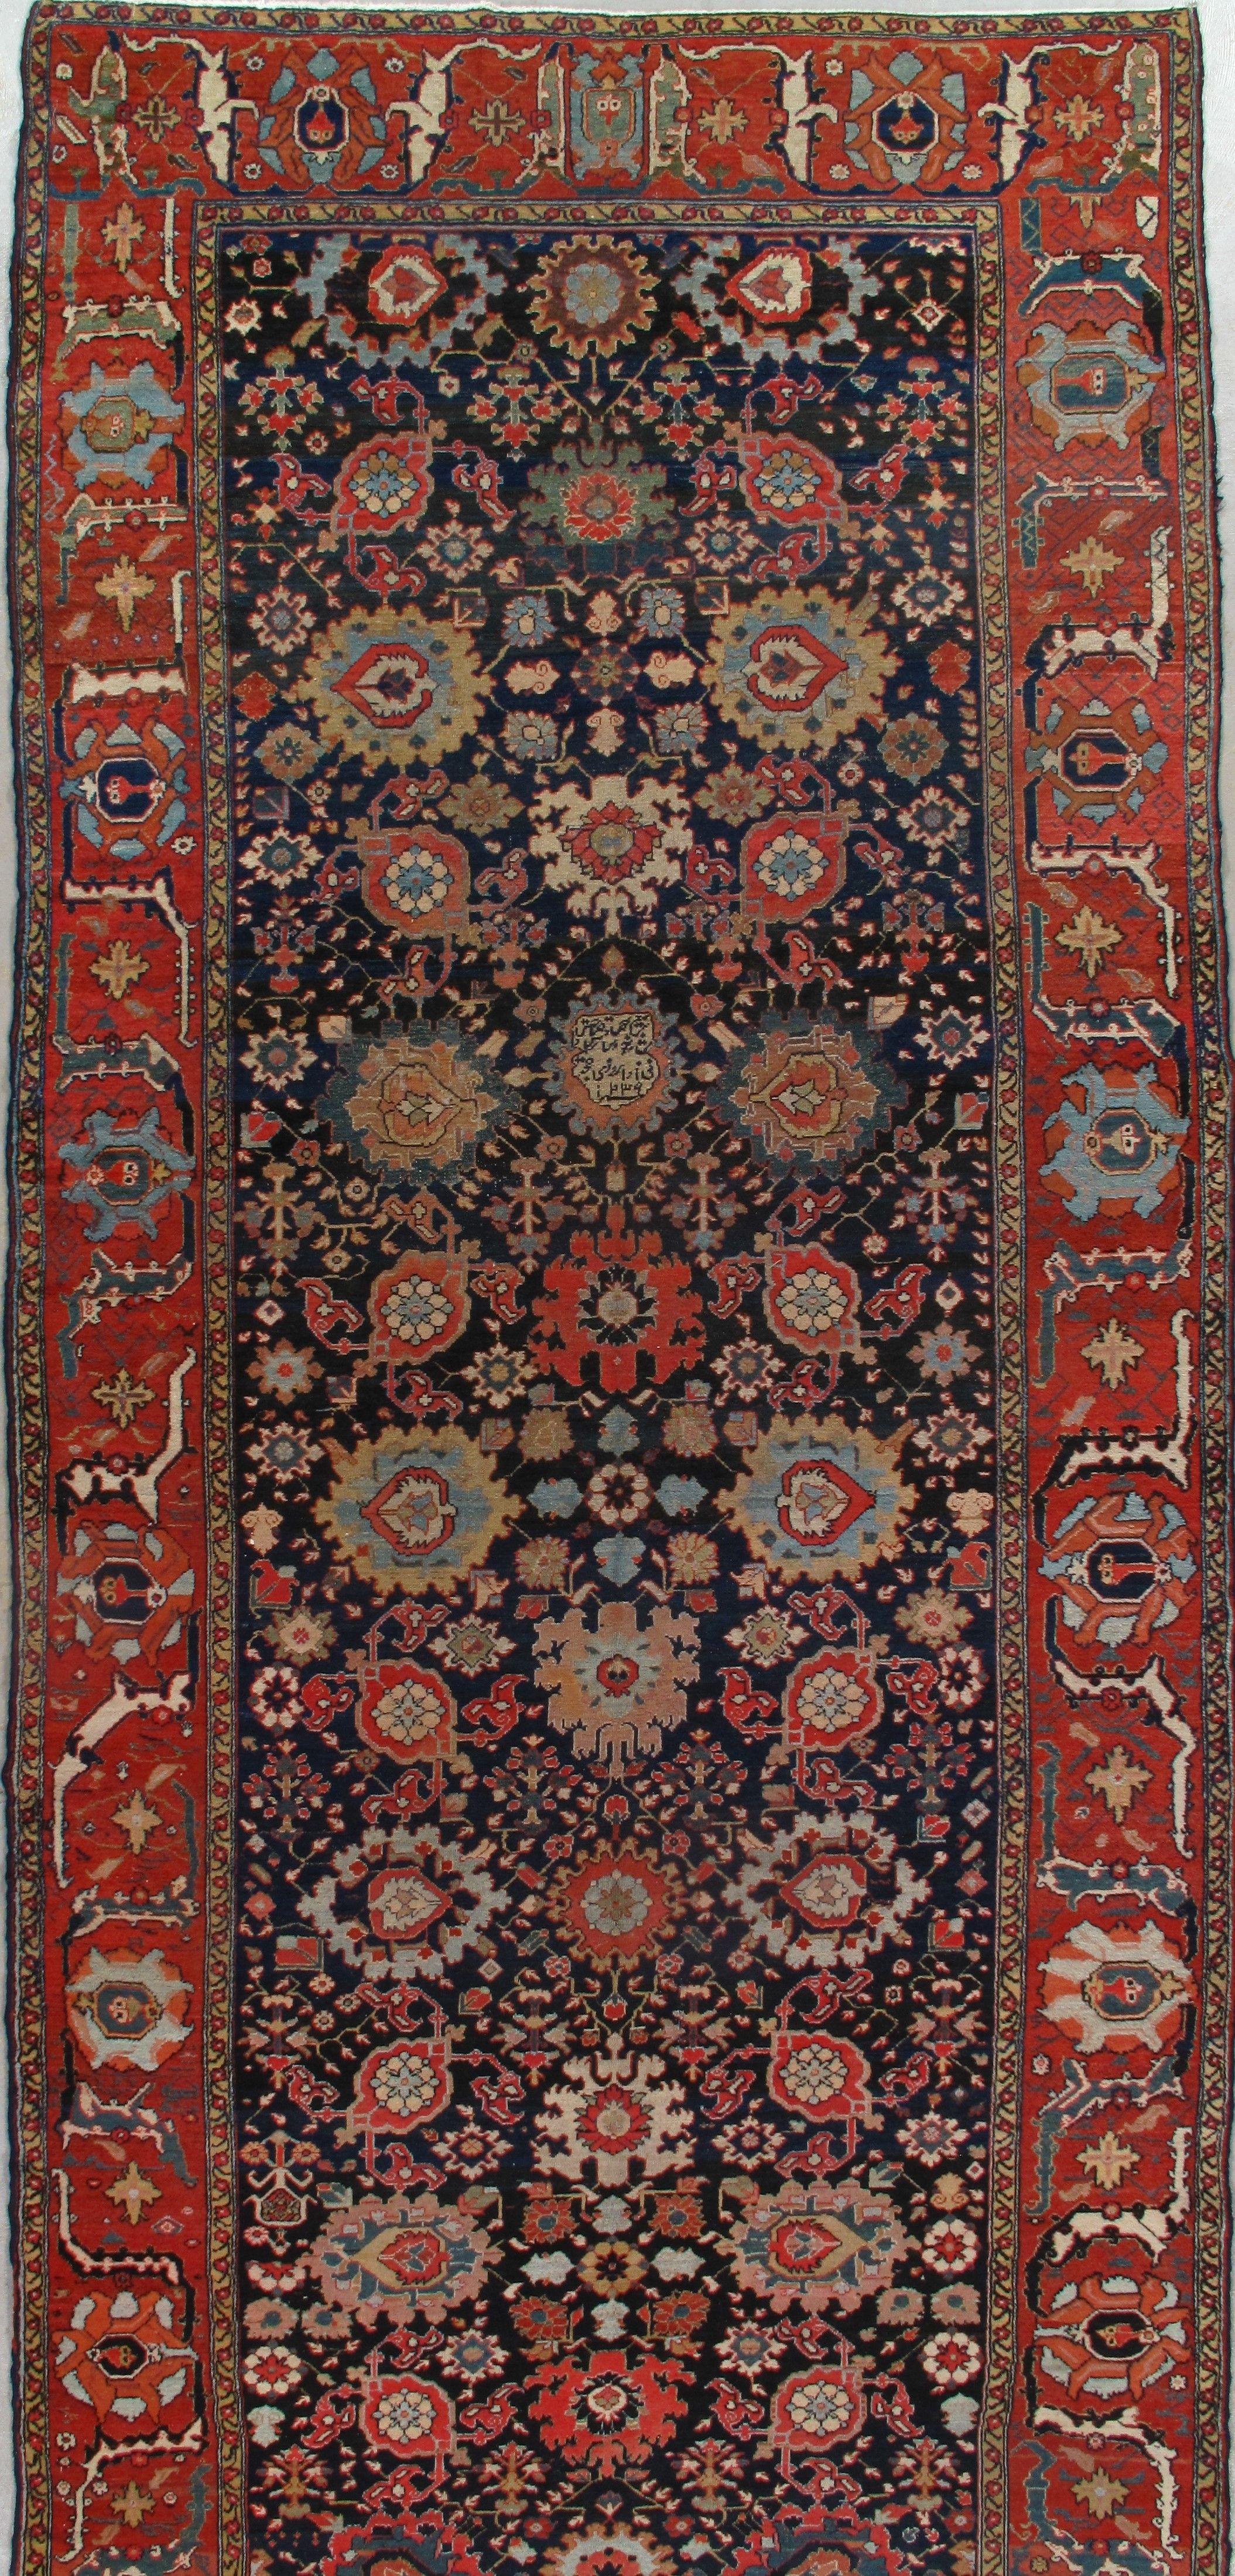 Antique Early Kurdish Gallery Carpet 161010 Antique